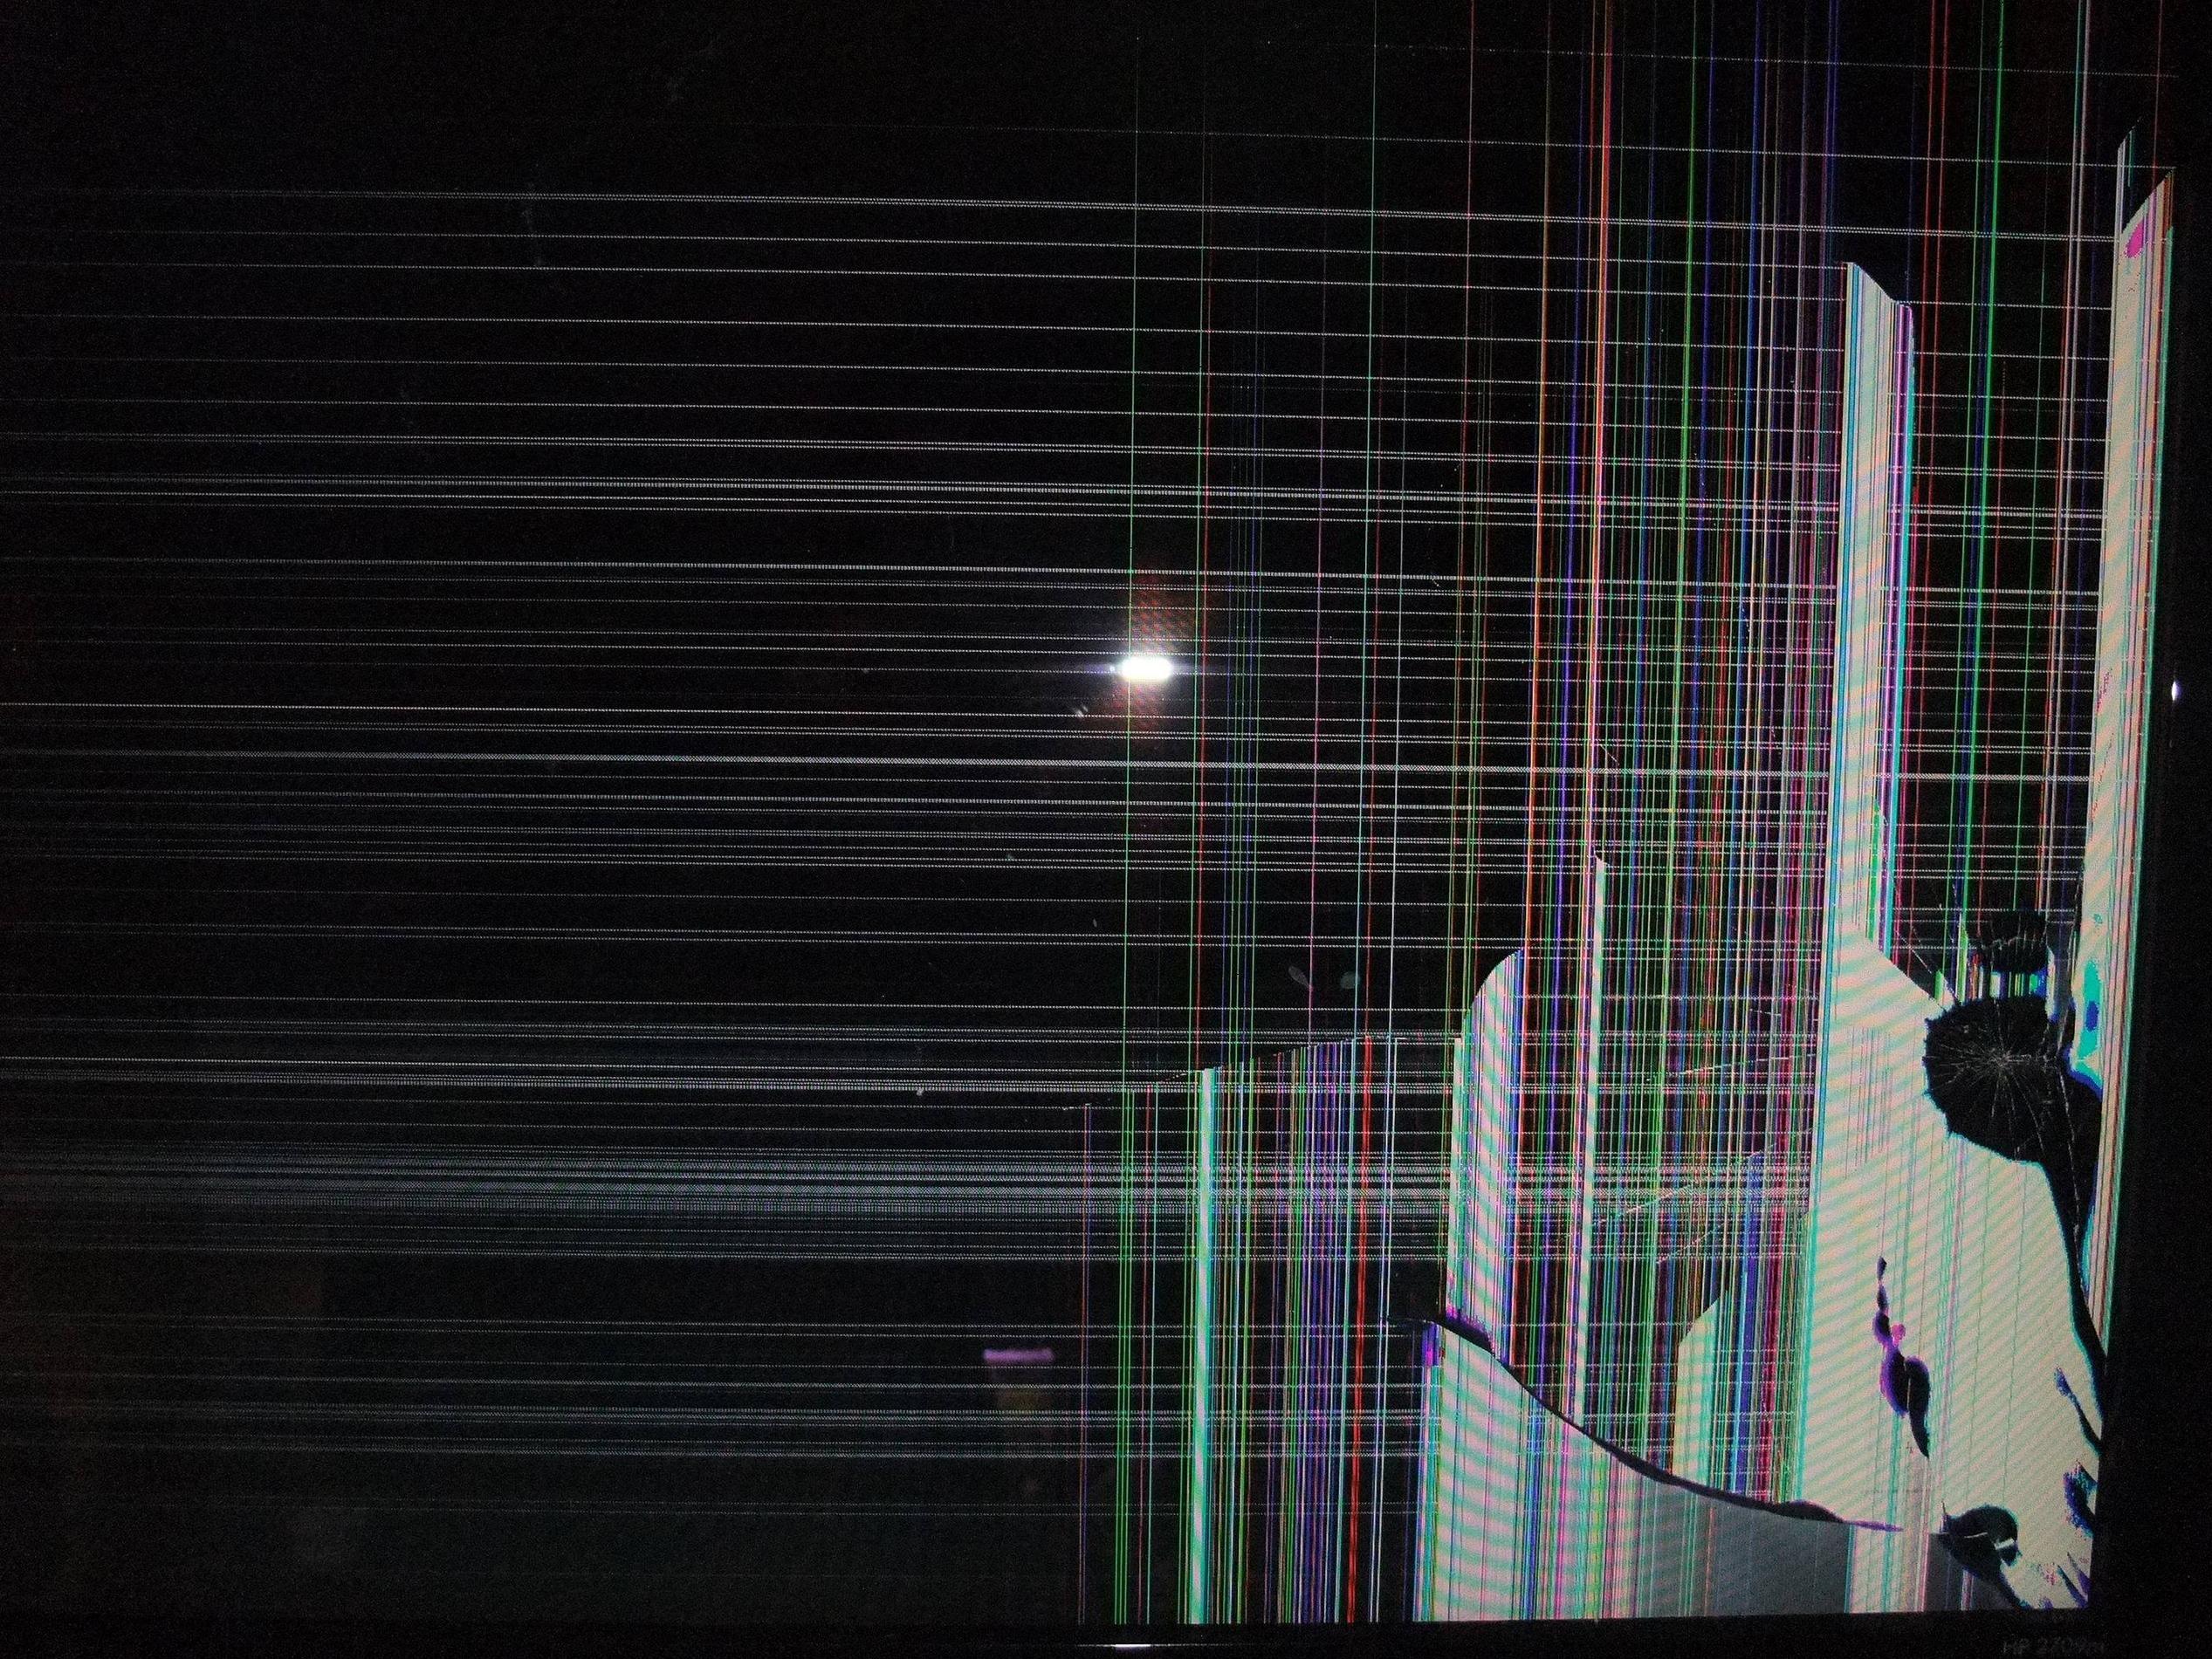 2534 X 1901 Broken Lcd Wallpaper Broken Screen Wallpaper Screen Wallpaper Screen Wallpaper Hd